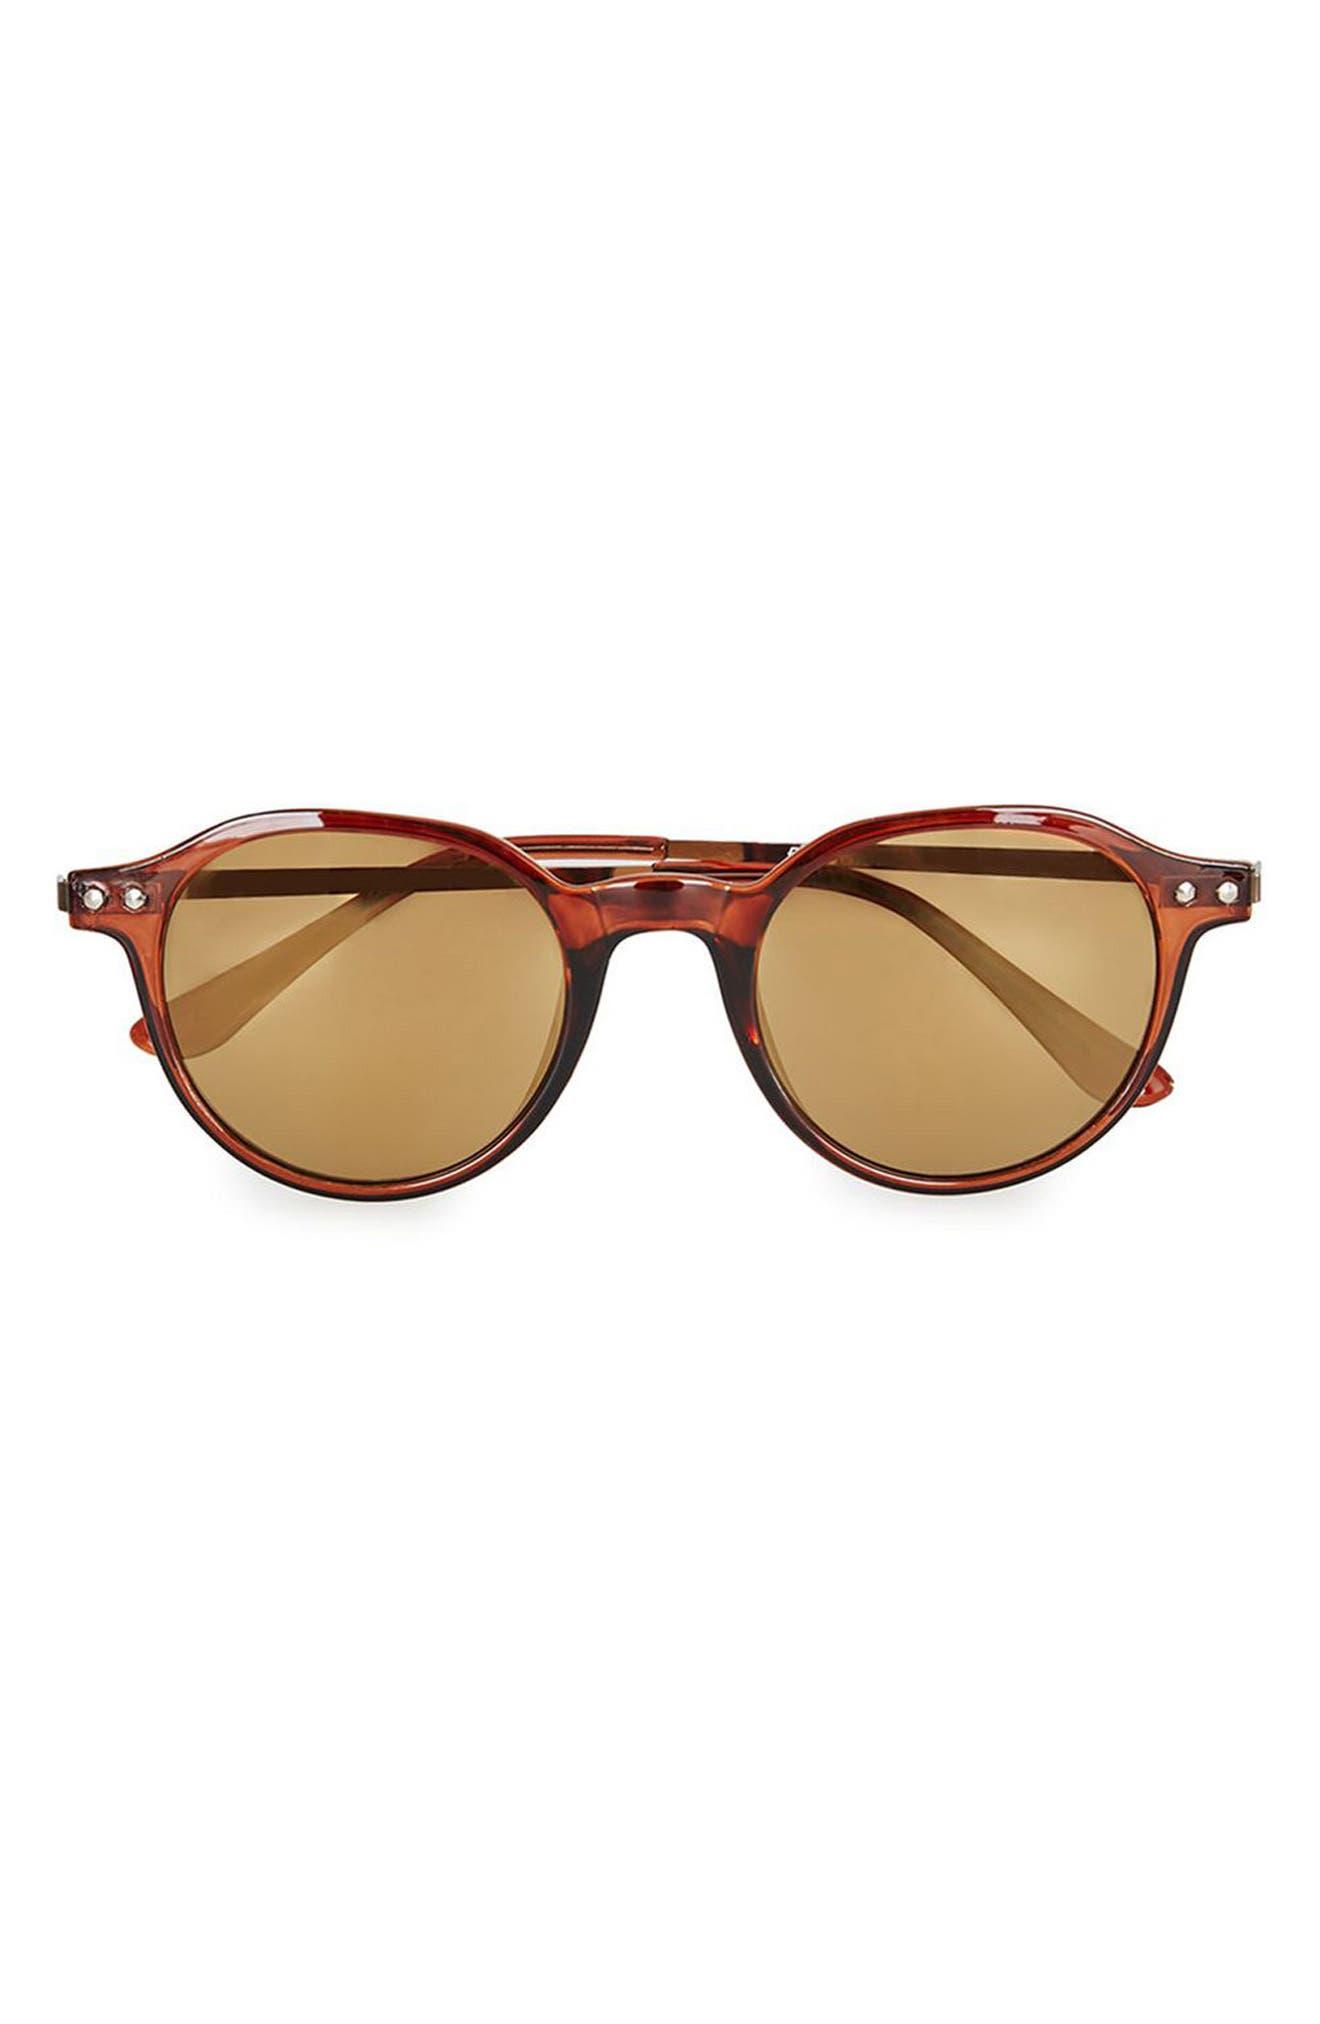 45mm Round Sunglasses,                         Main,                         color, 200